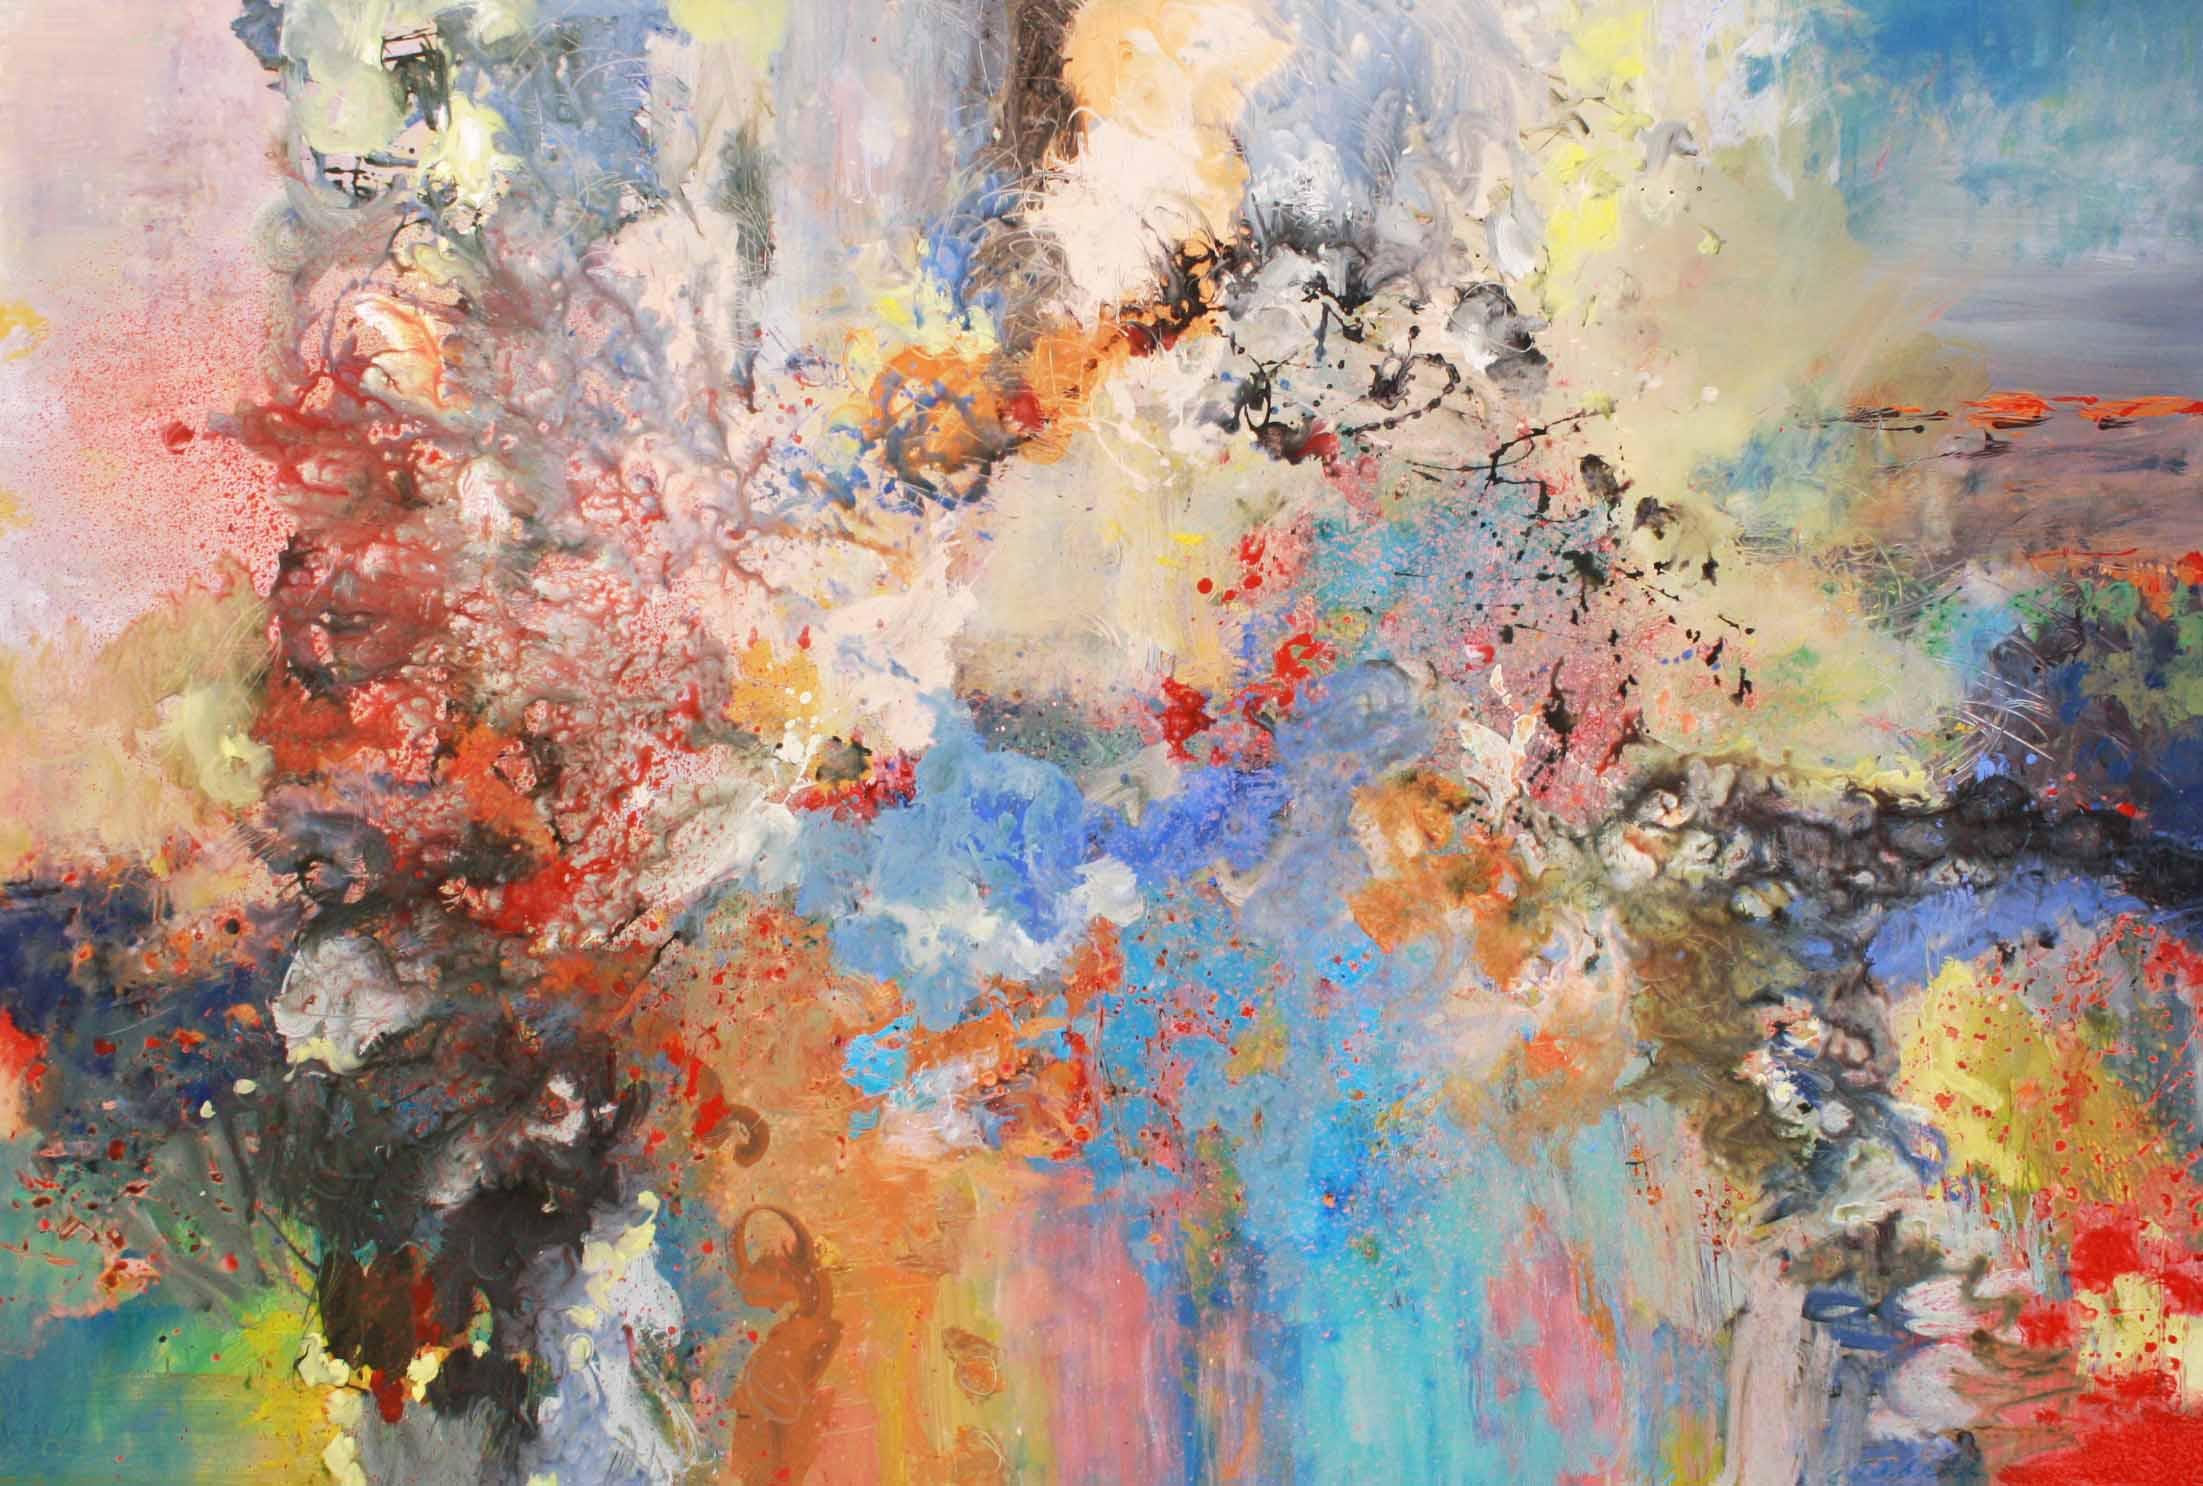 Richard Strauss - FourLastSongs -September 54 x 80 Acrylic on Canvas $ 6800